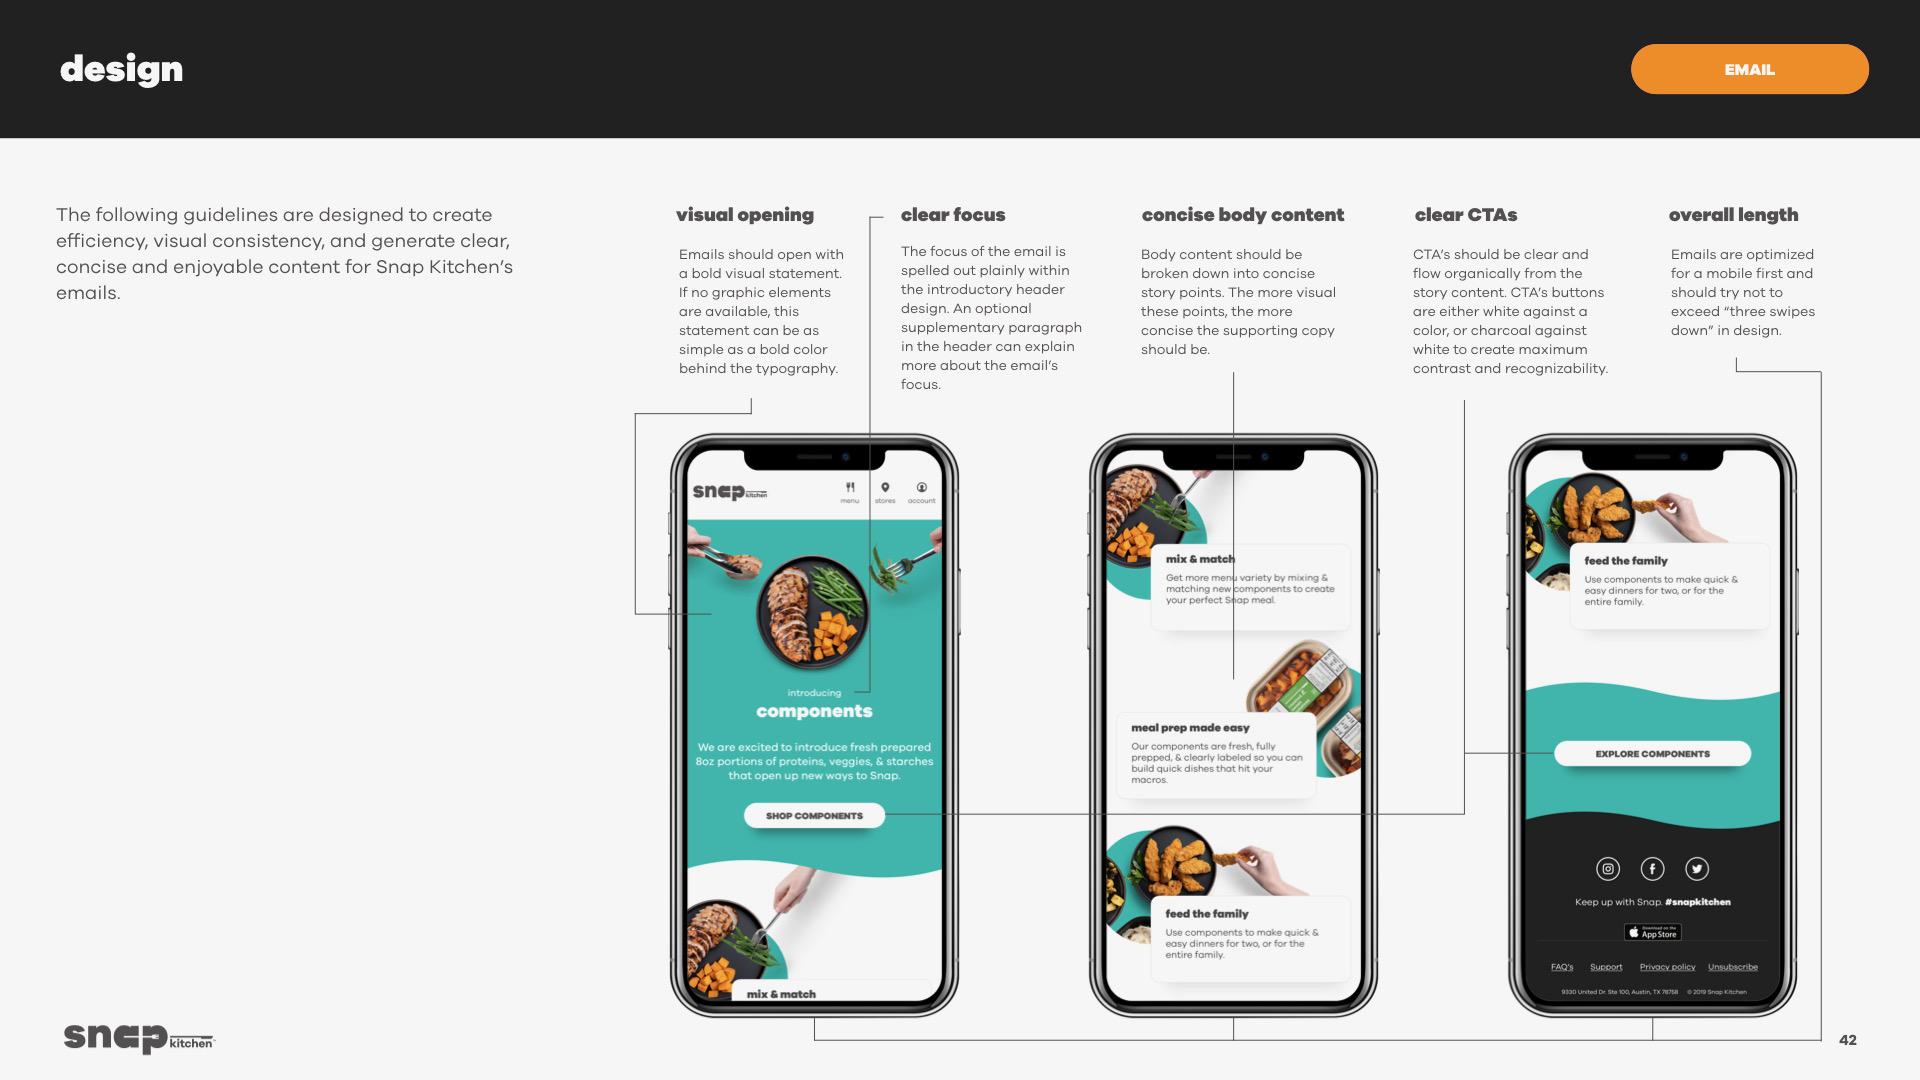 2019.4.12 snap kitchen brand guidelines.001.jpeg